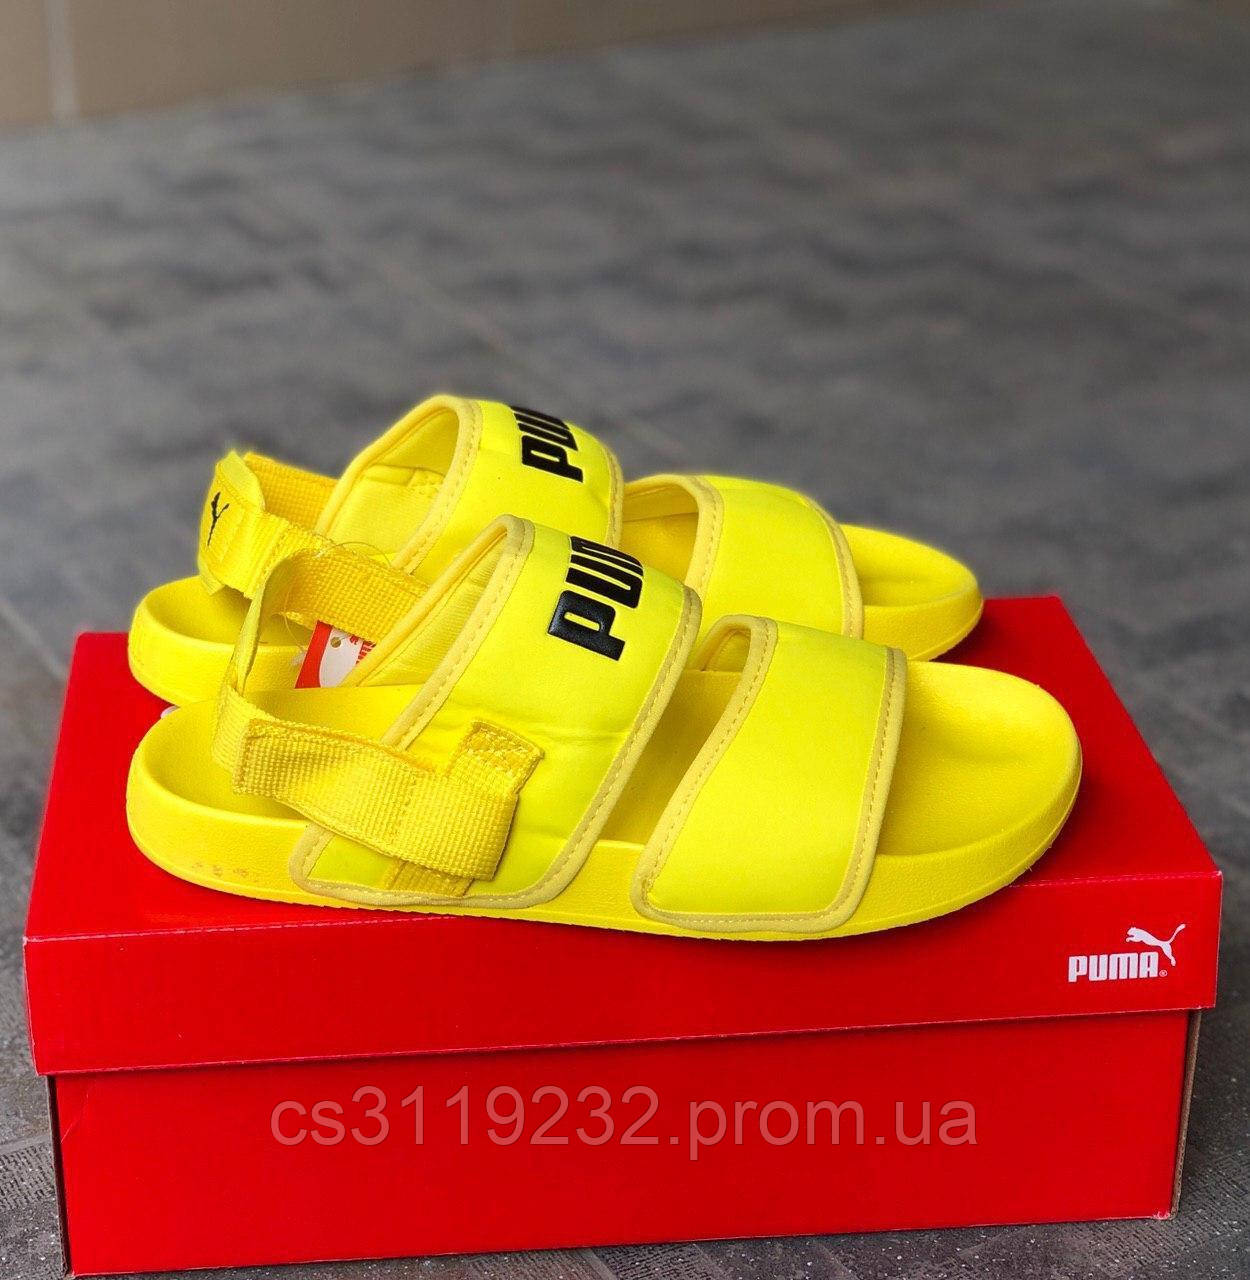 Женские сандали Puma x Hyuna Leadcat YLM Lite Sandal (желтые)